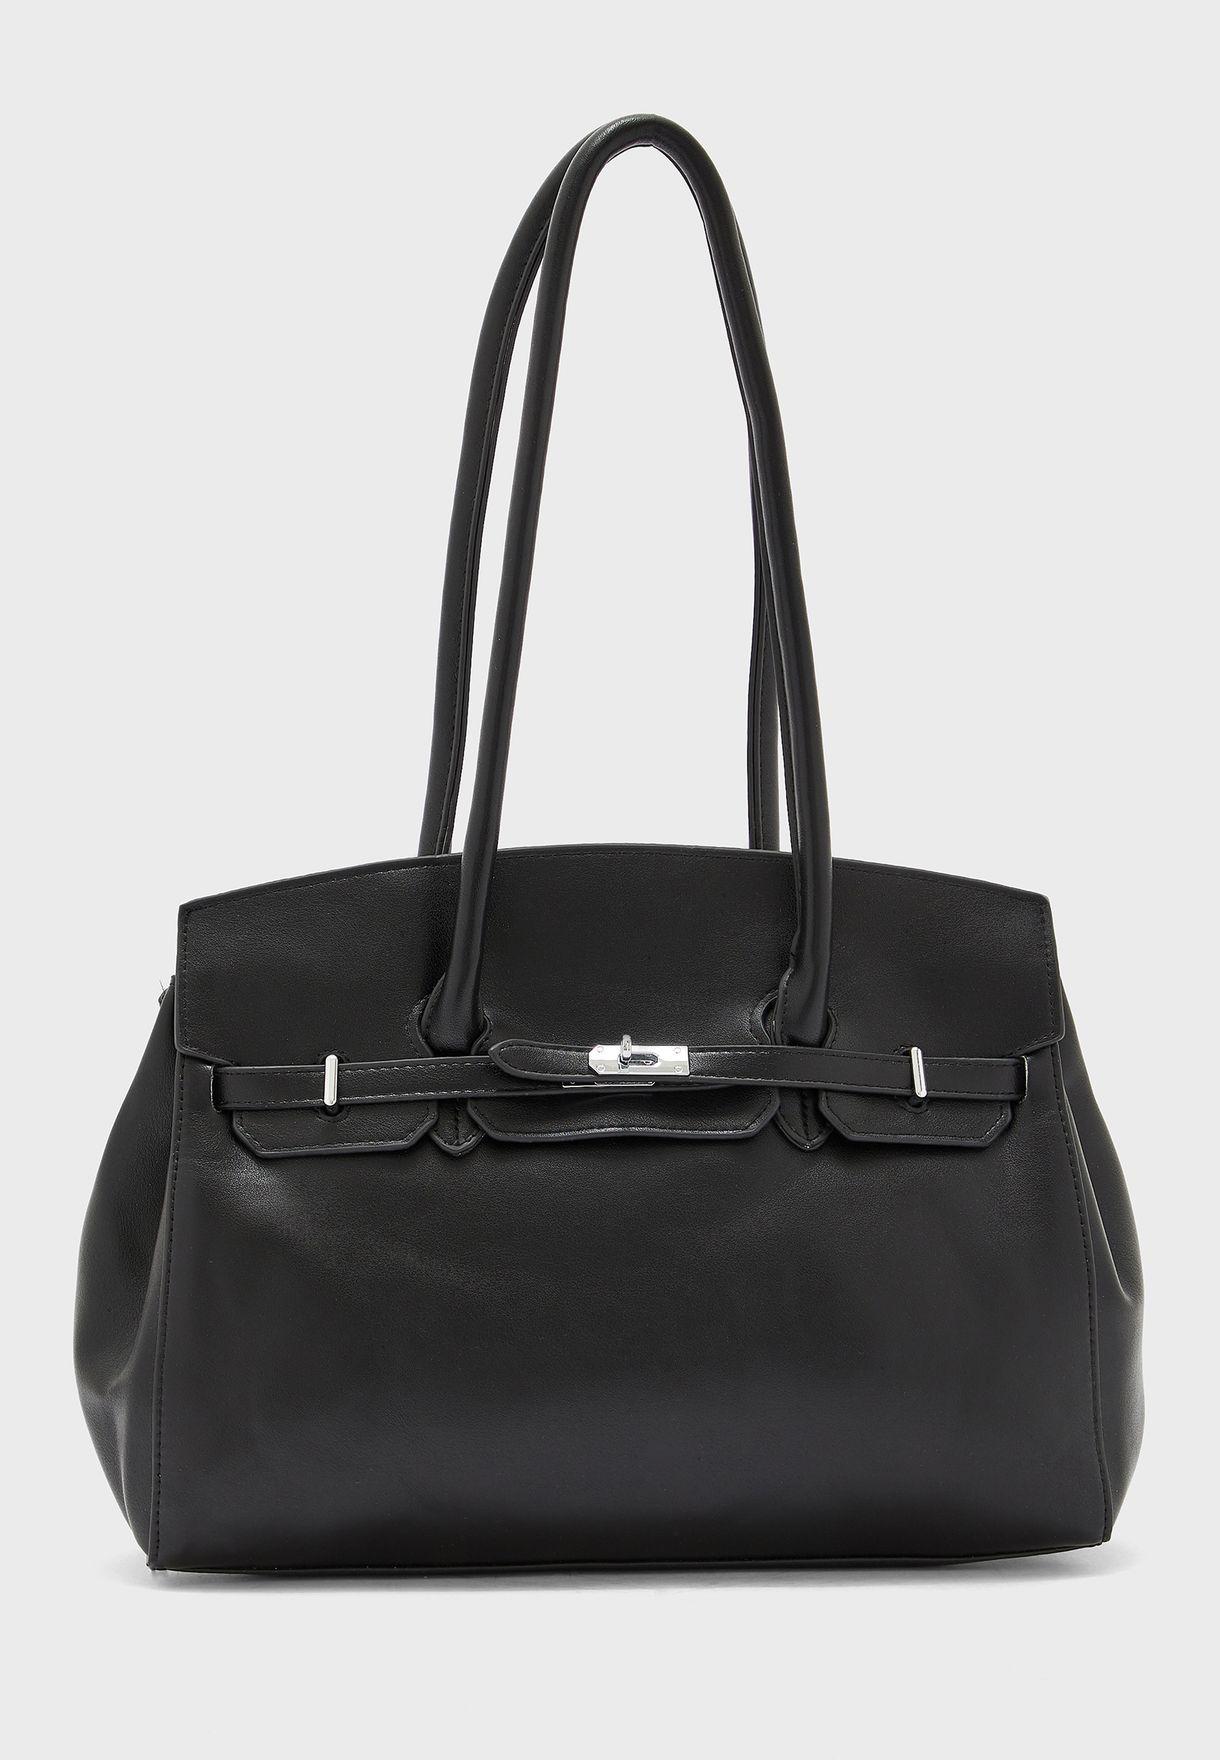 Long Handle Handbag